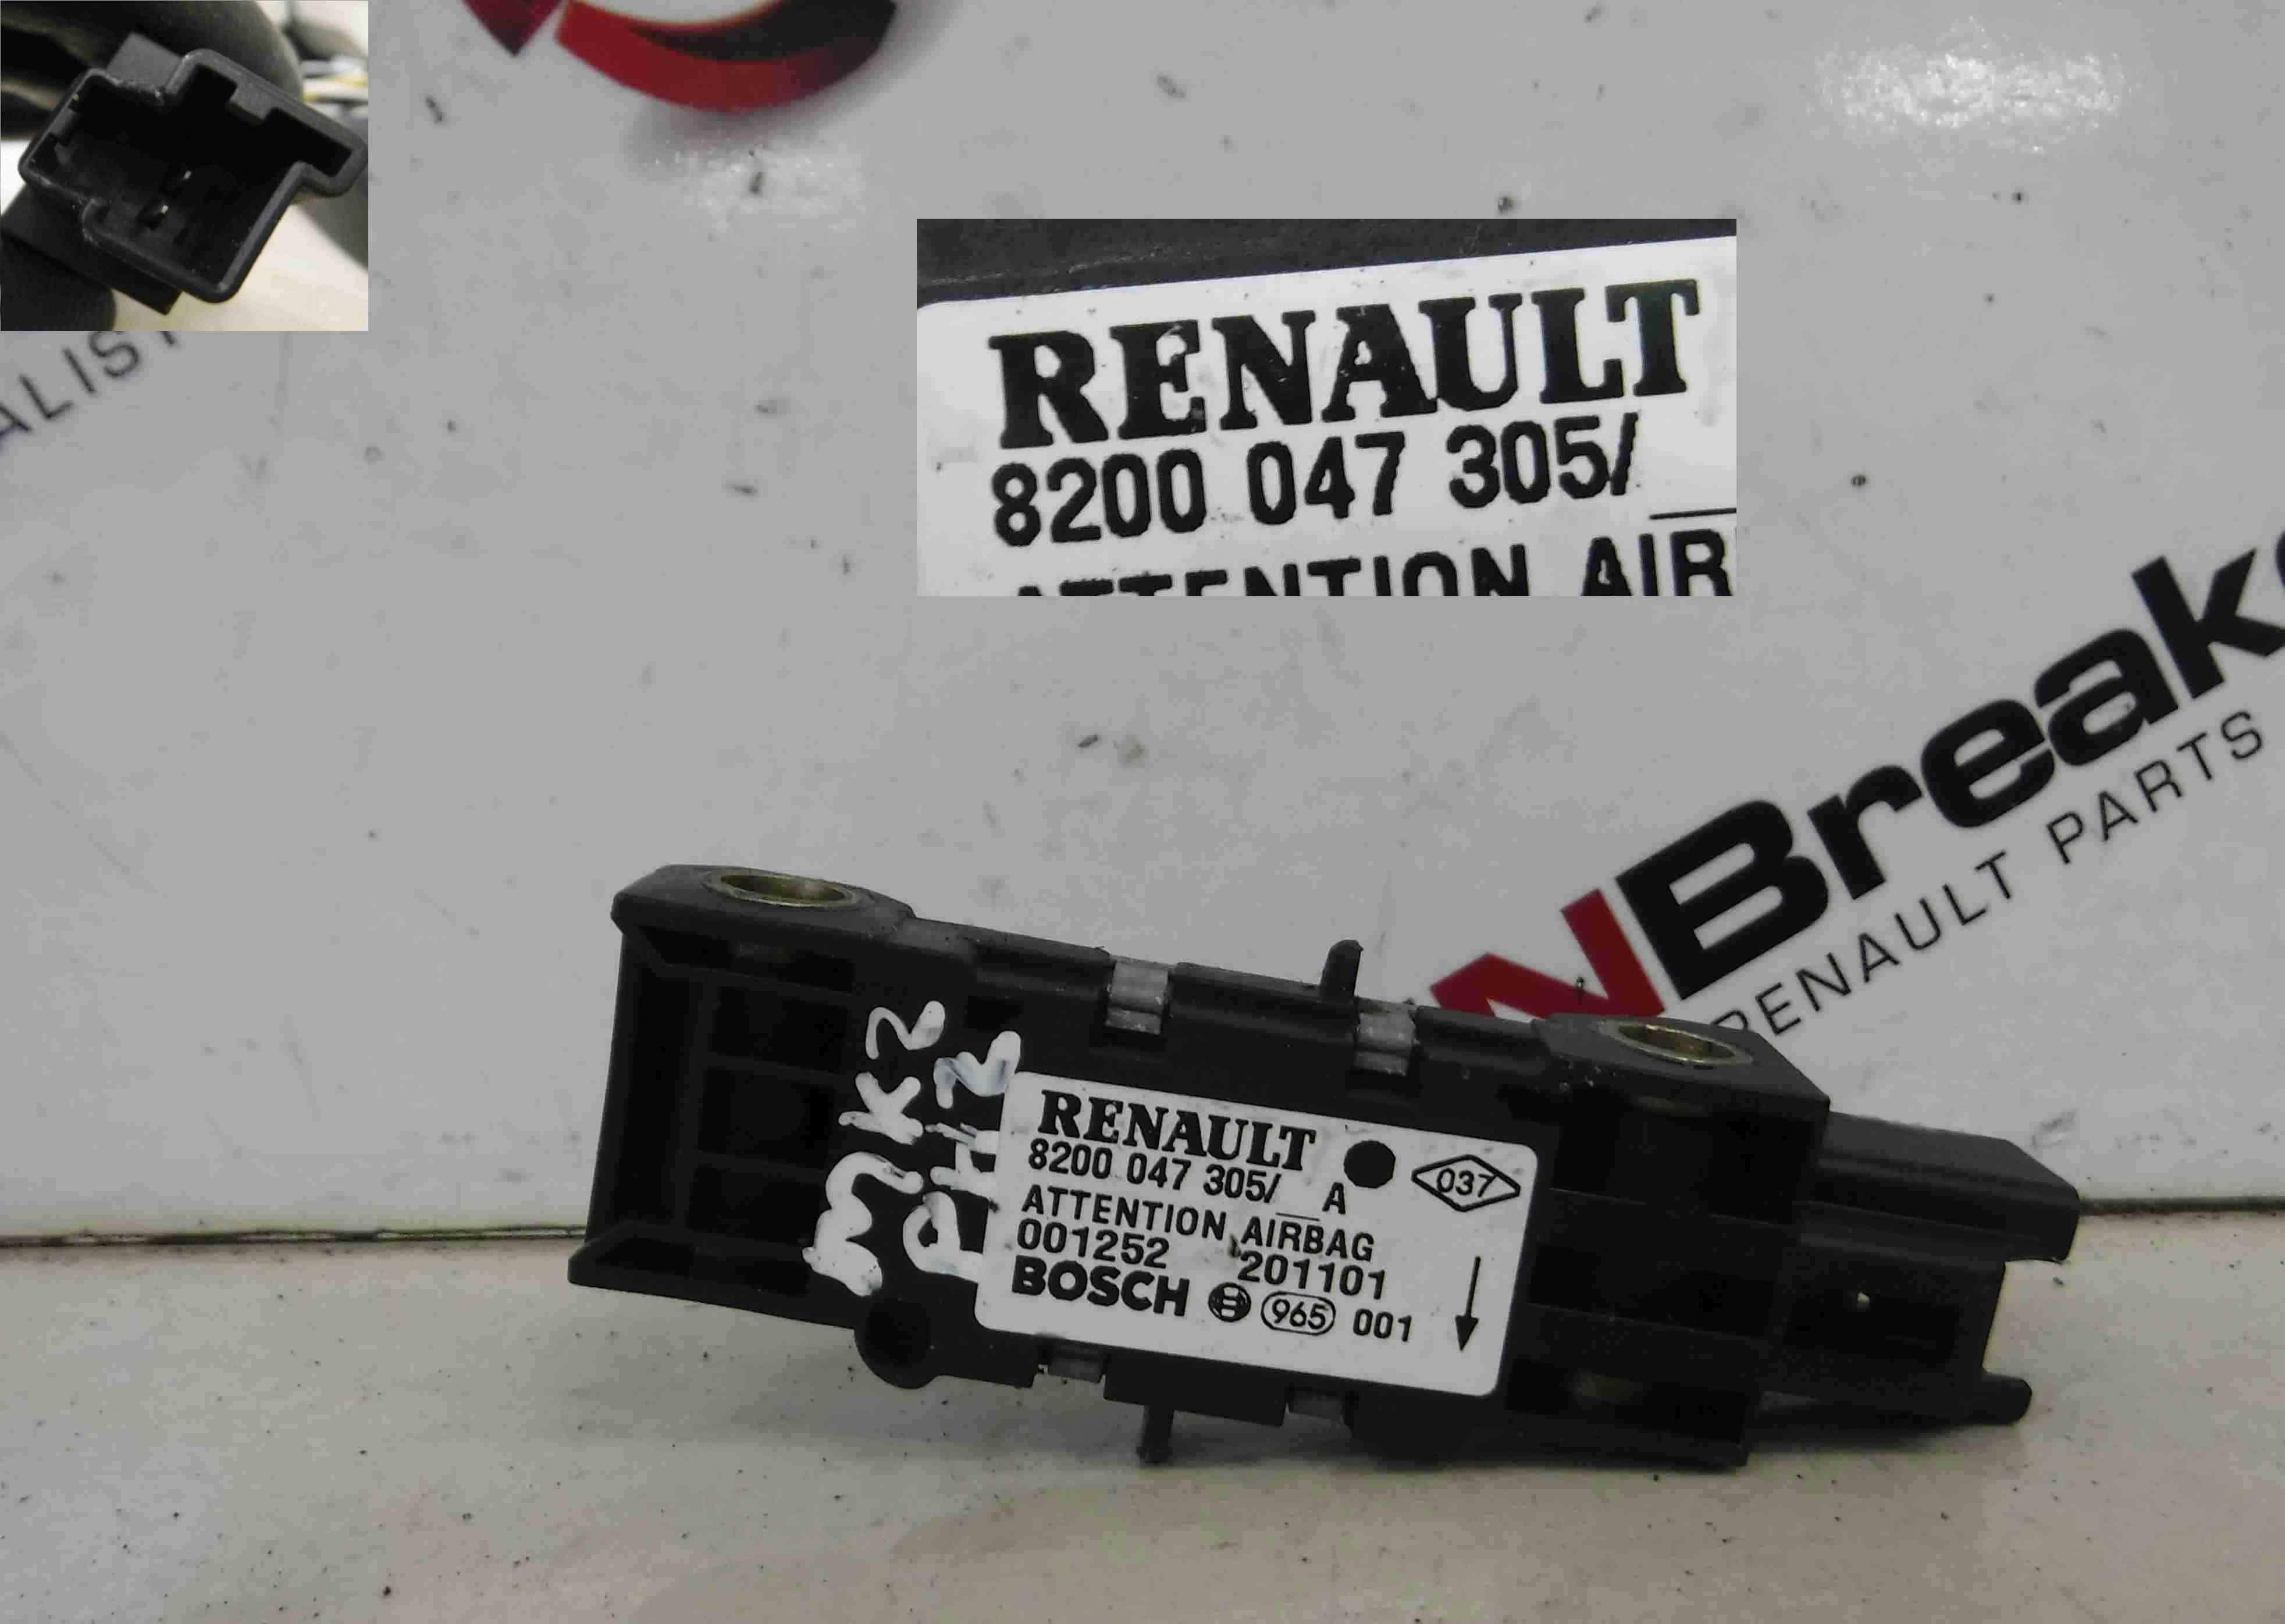 Renault Clio MK2 2001-2006 Airbag Impact Sensor 8200047305